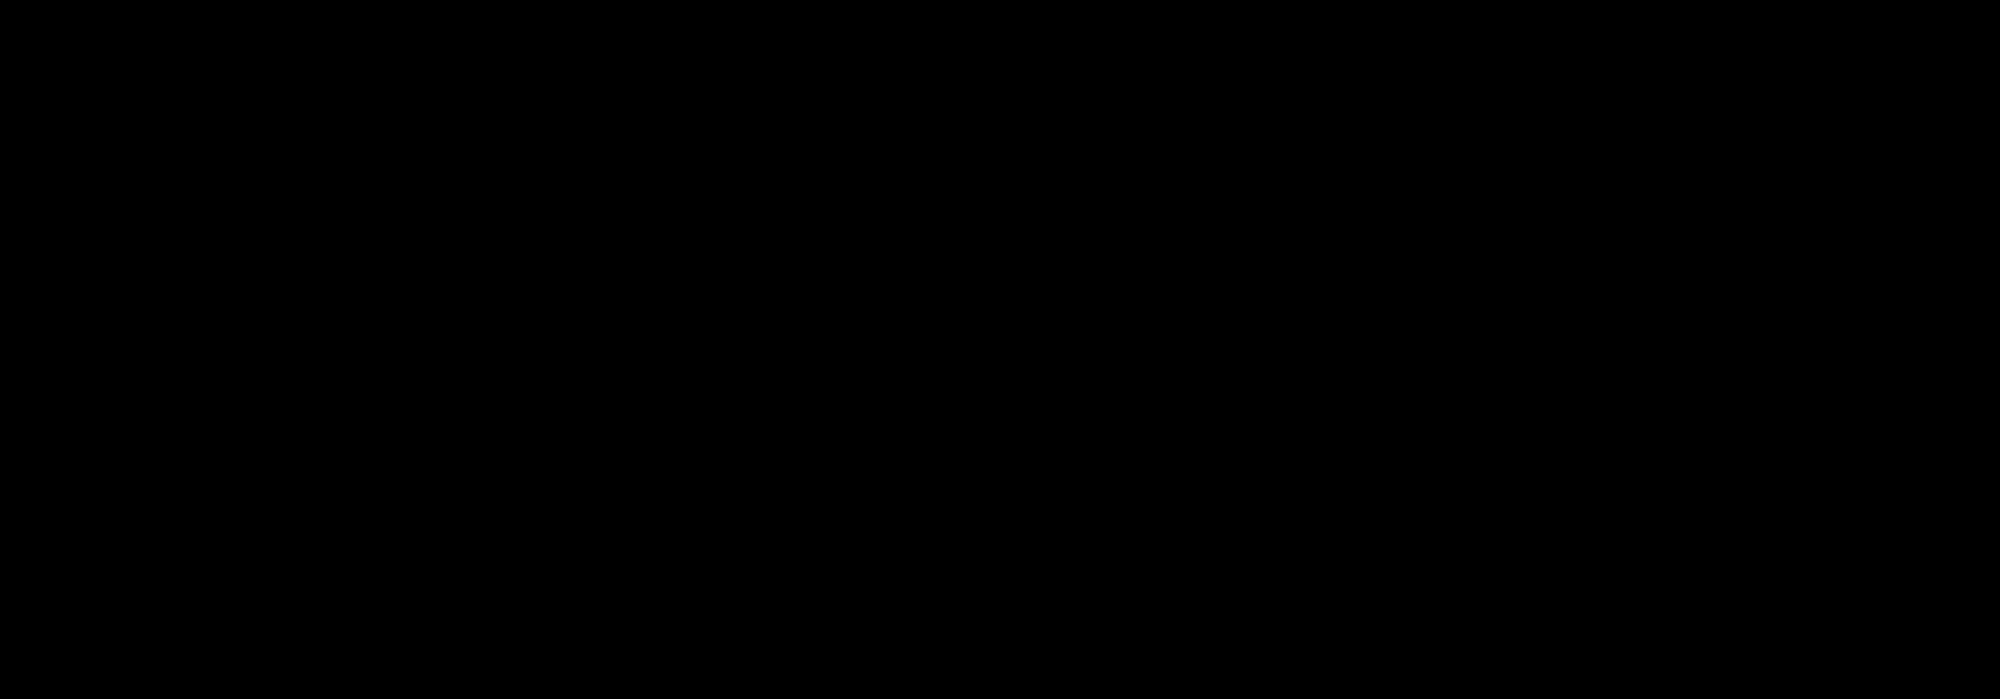 2000x699 Fileskeleton Key Silhouette.svg